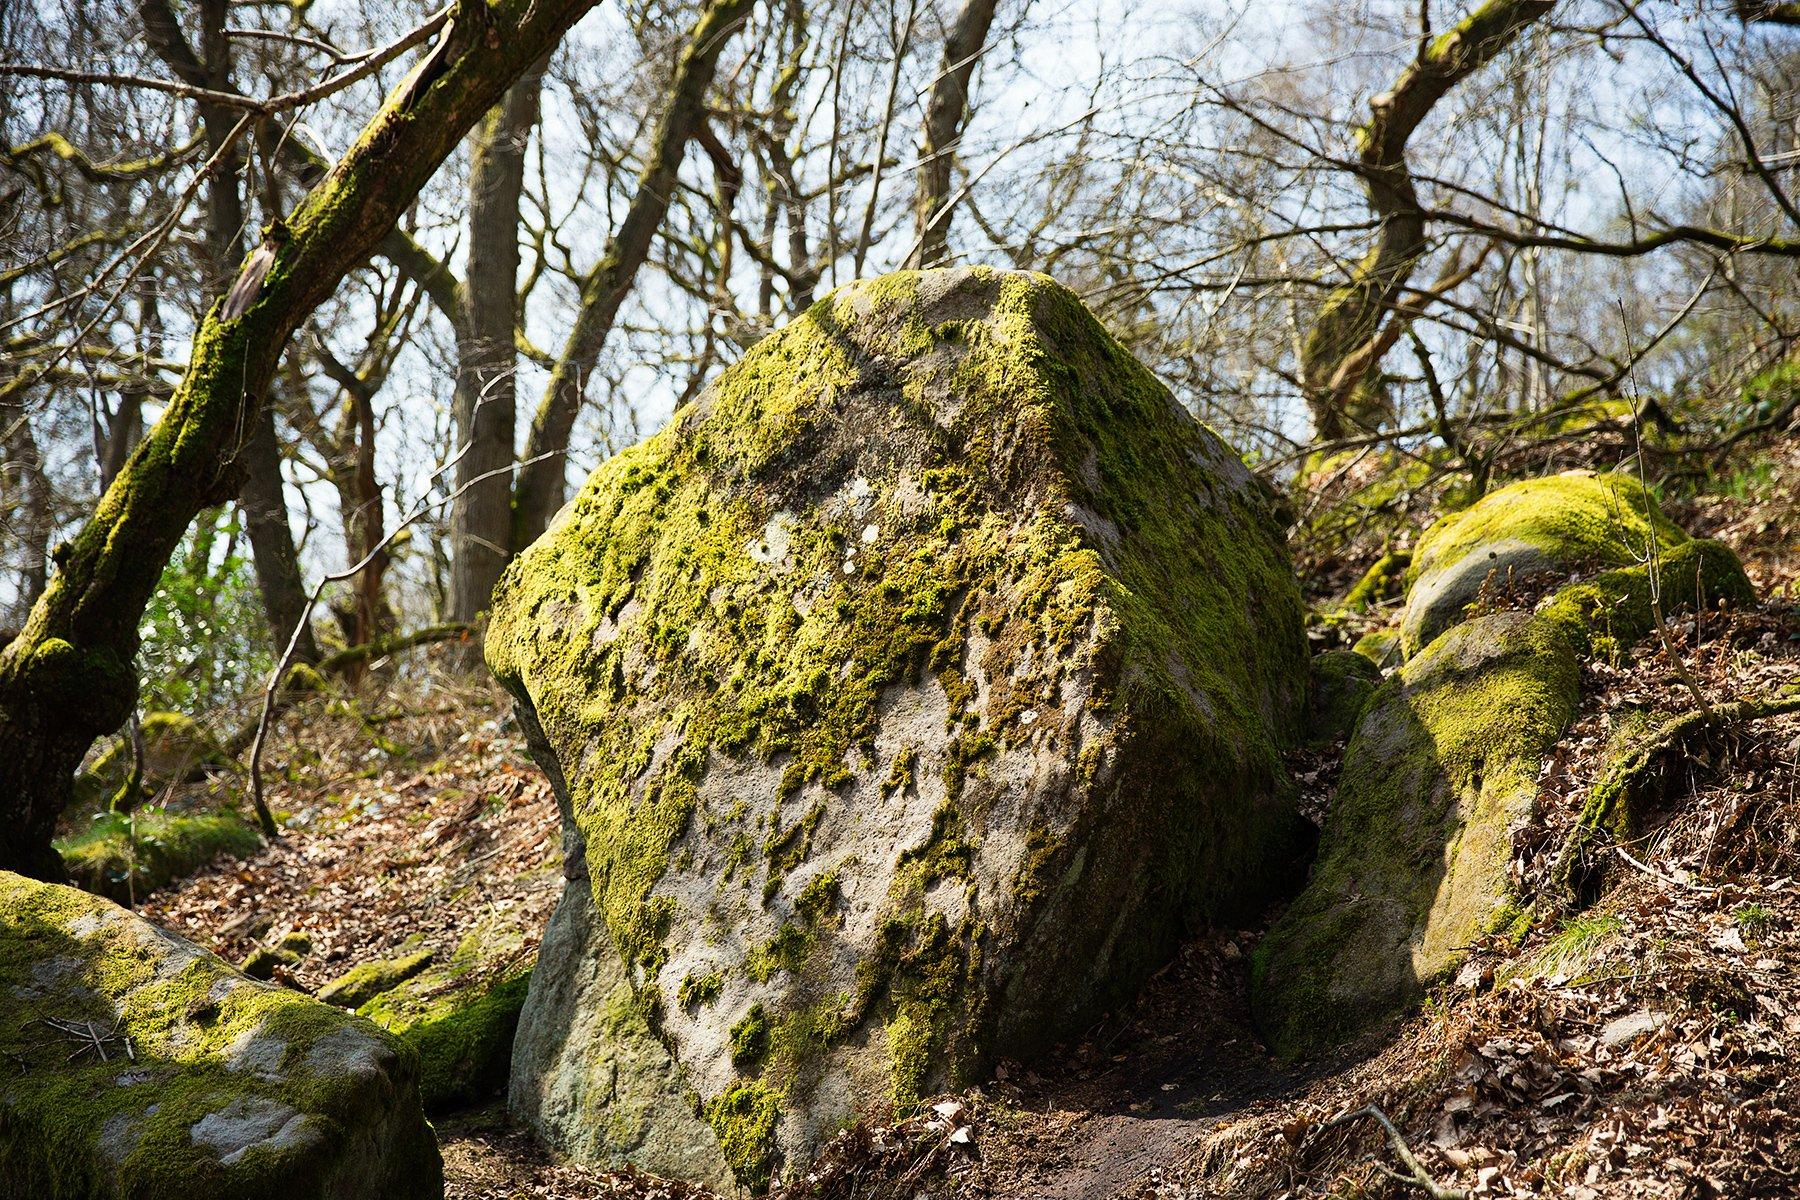 Padley Gorge stones